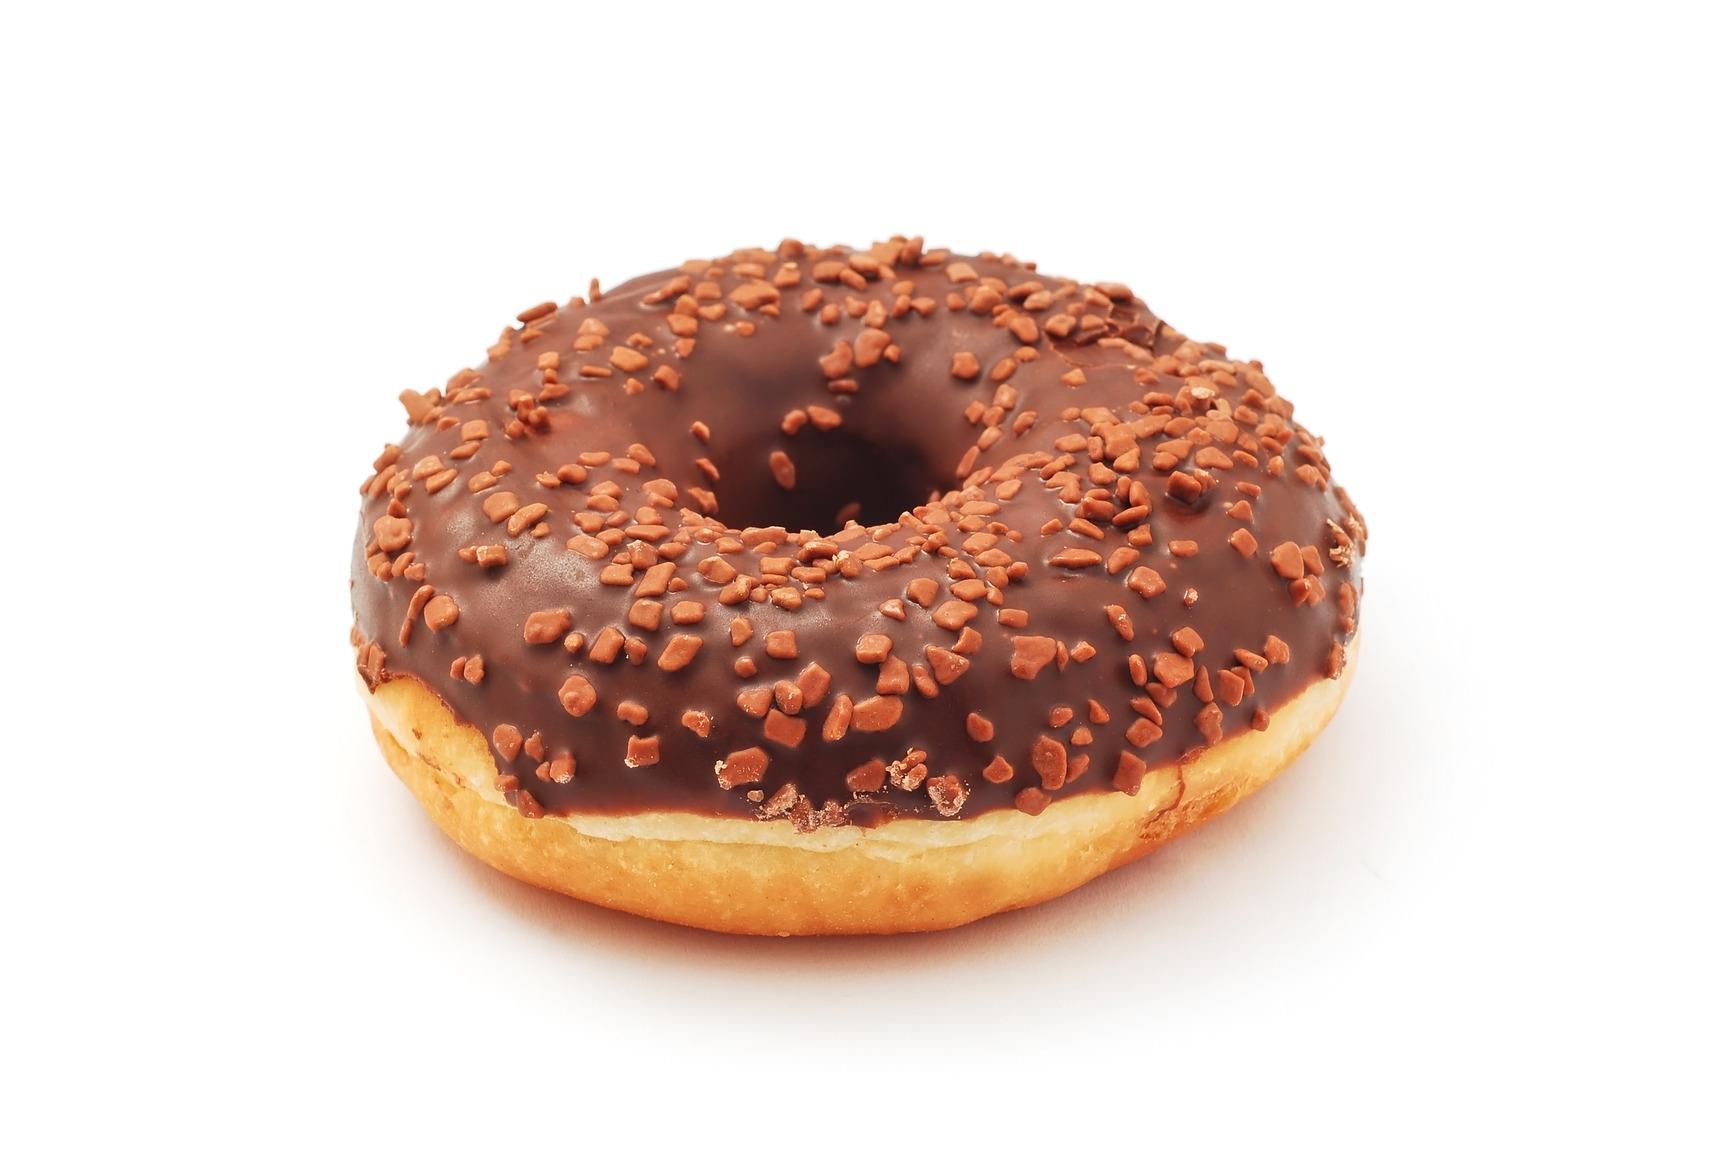 chocolate doughnut on white background